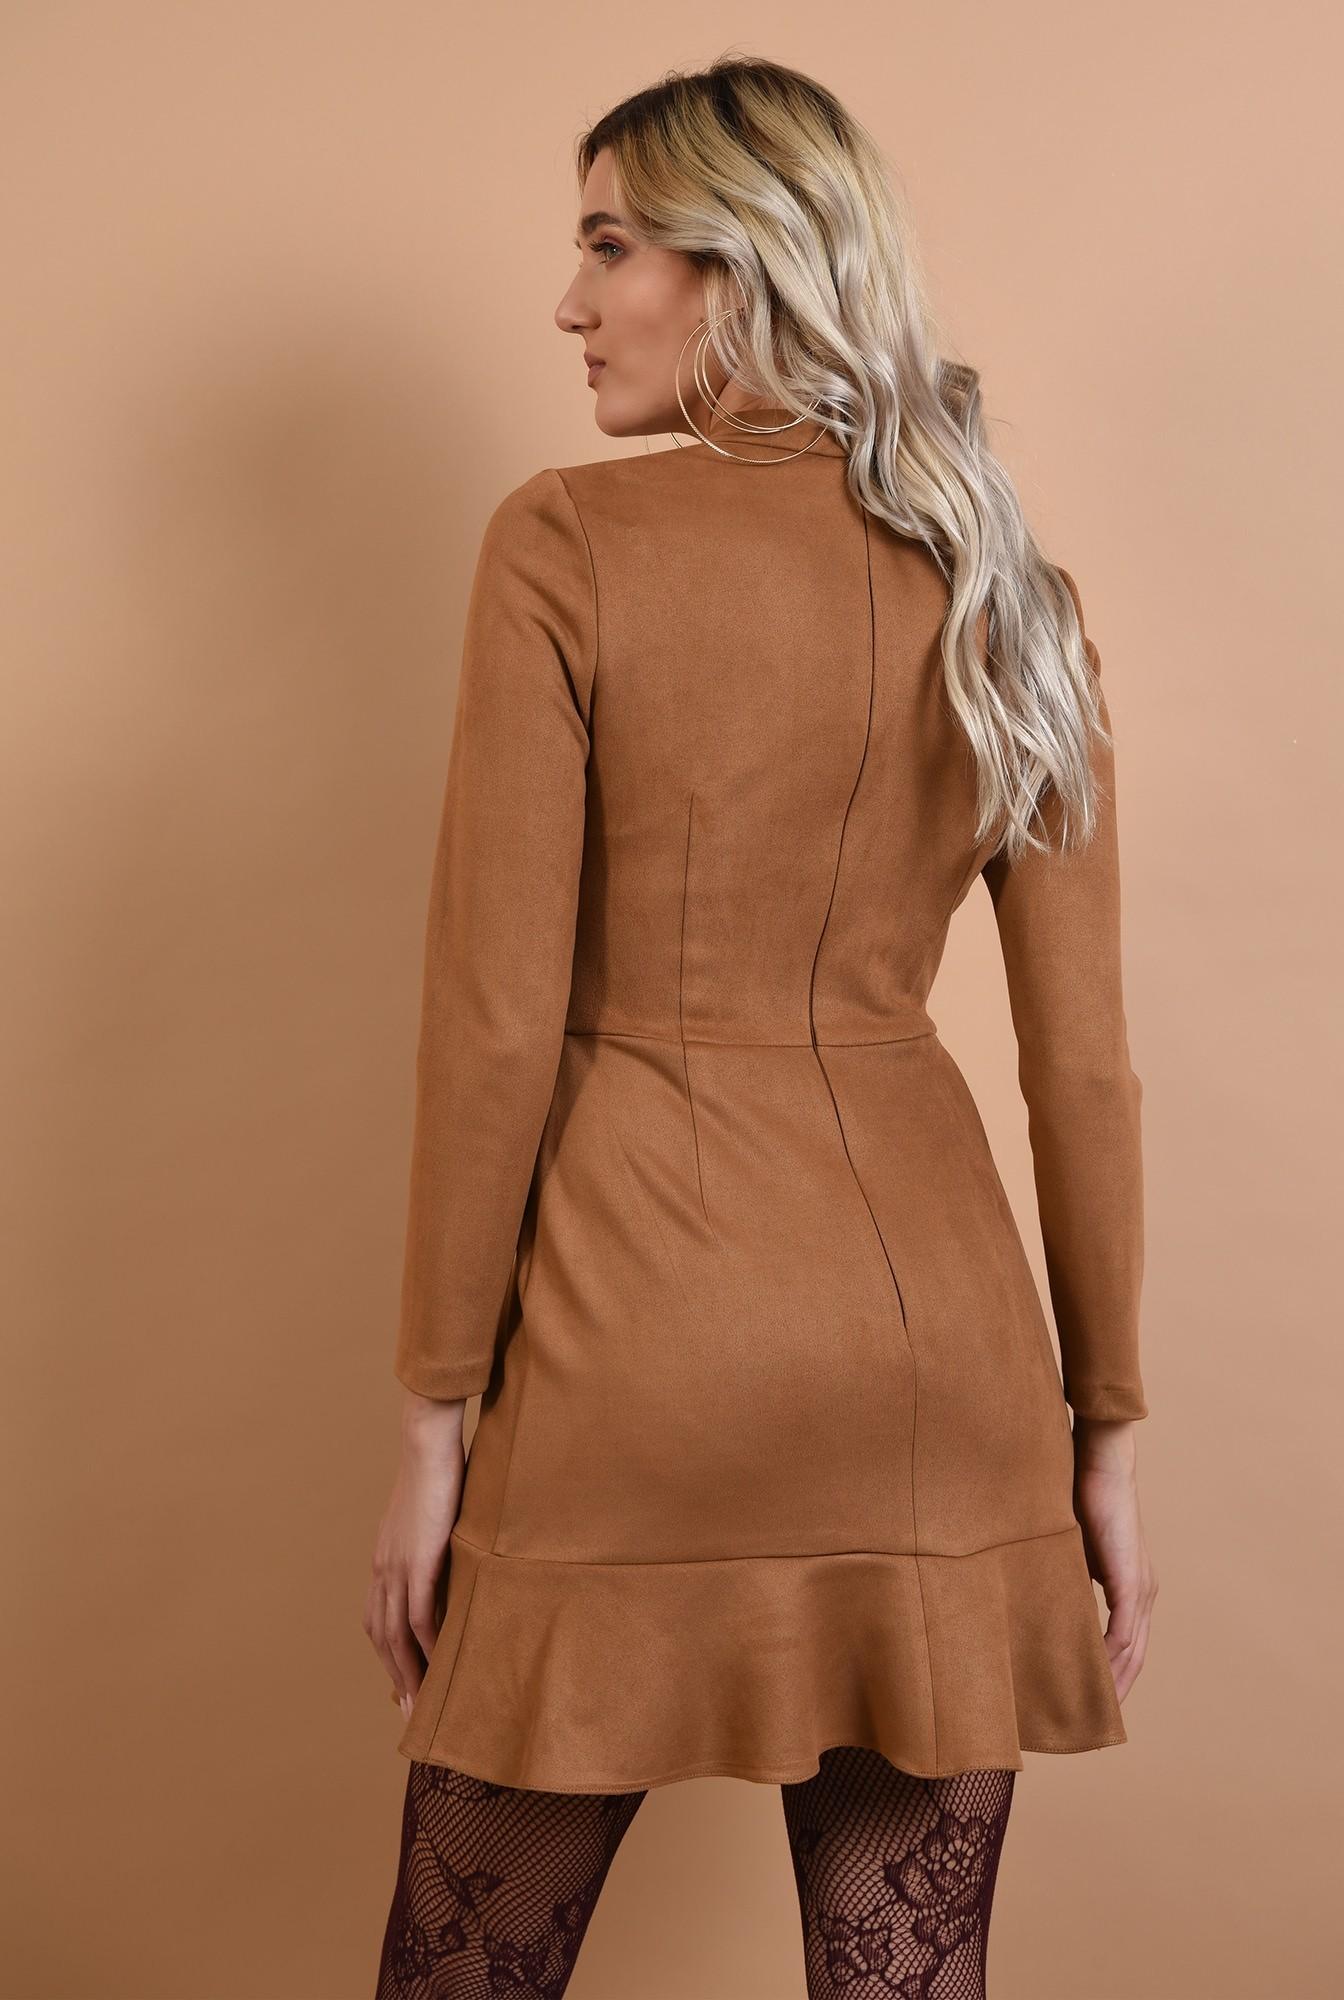 1 - 360 - rochie din piele intoarsa, scurta, Poema, guler, maneci lungi, volan